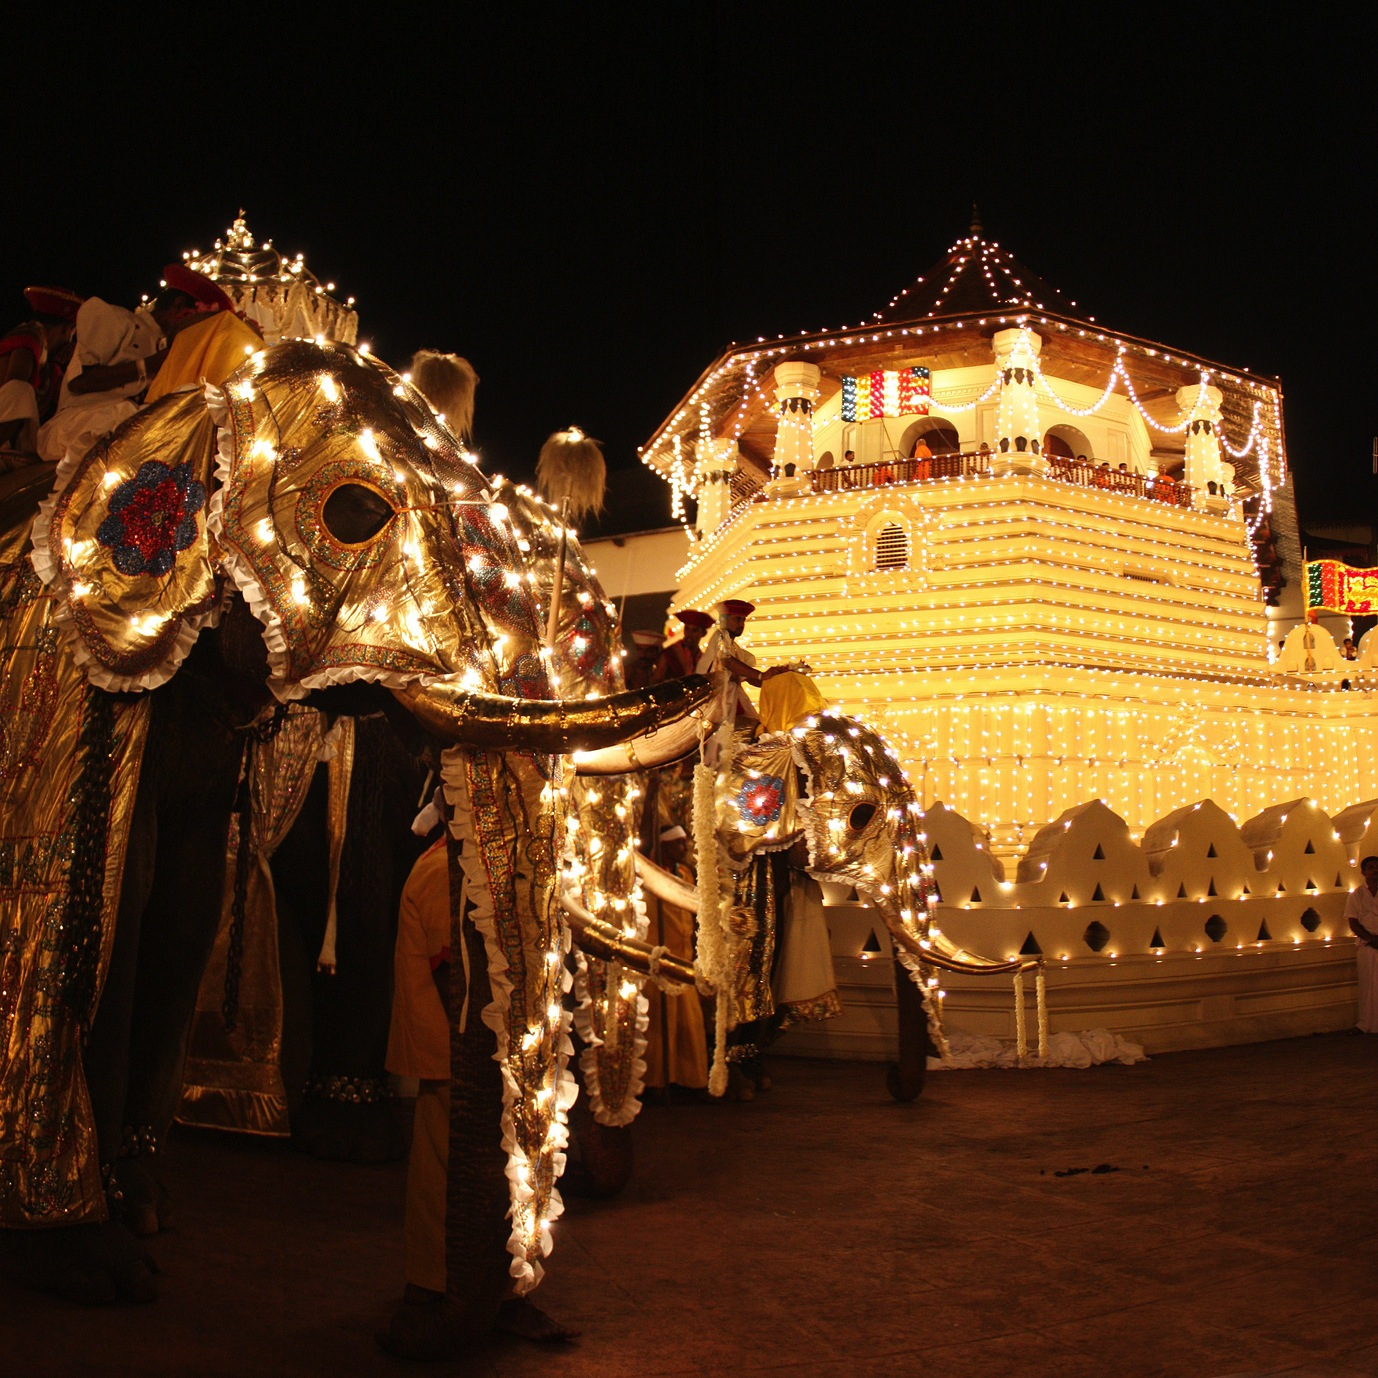 Esala Perahera Kandy original - آشنایی با جشن های بین المللی دنیا